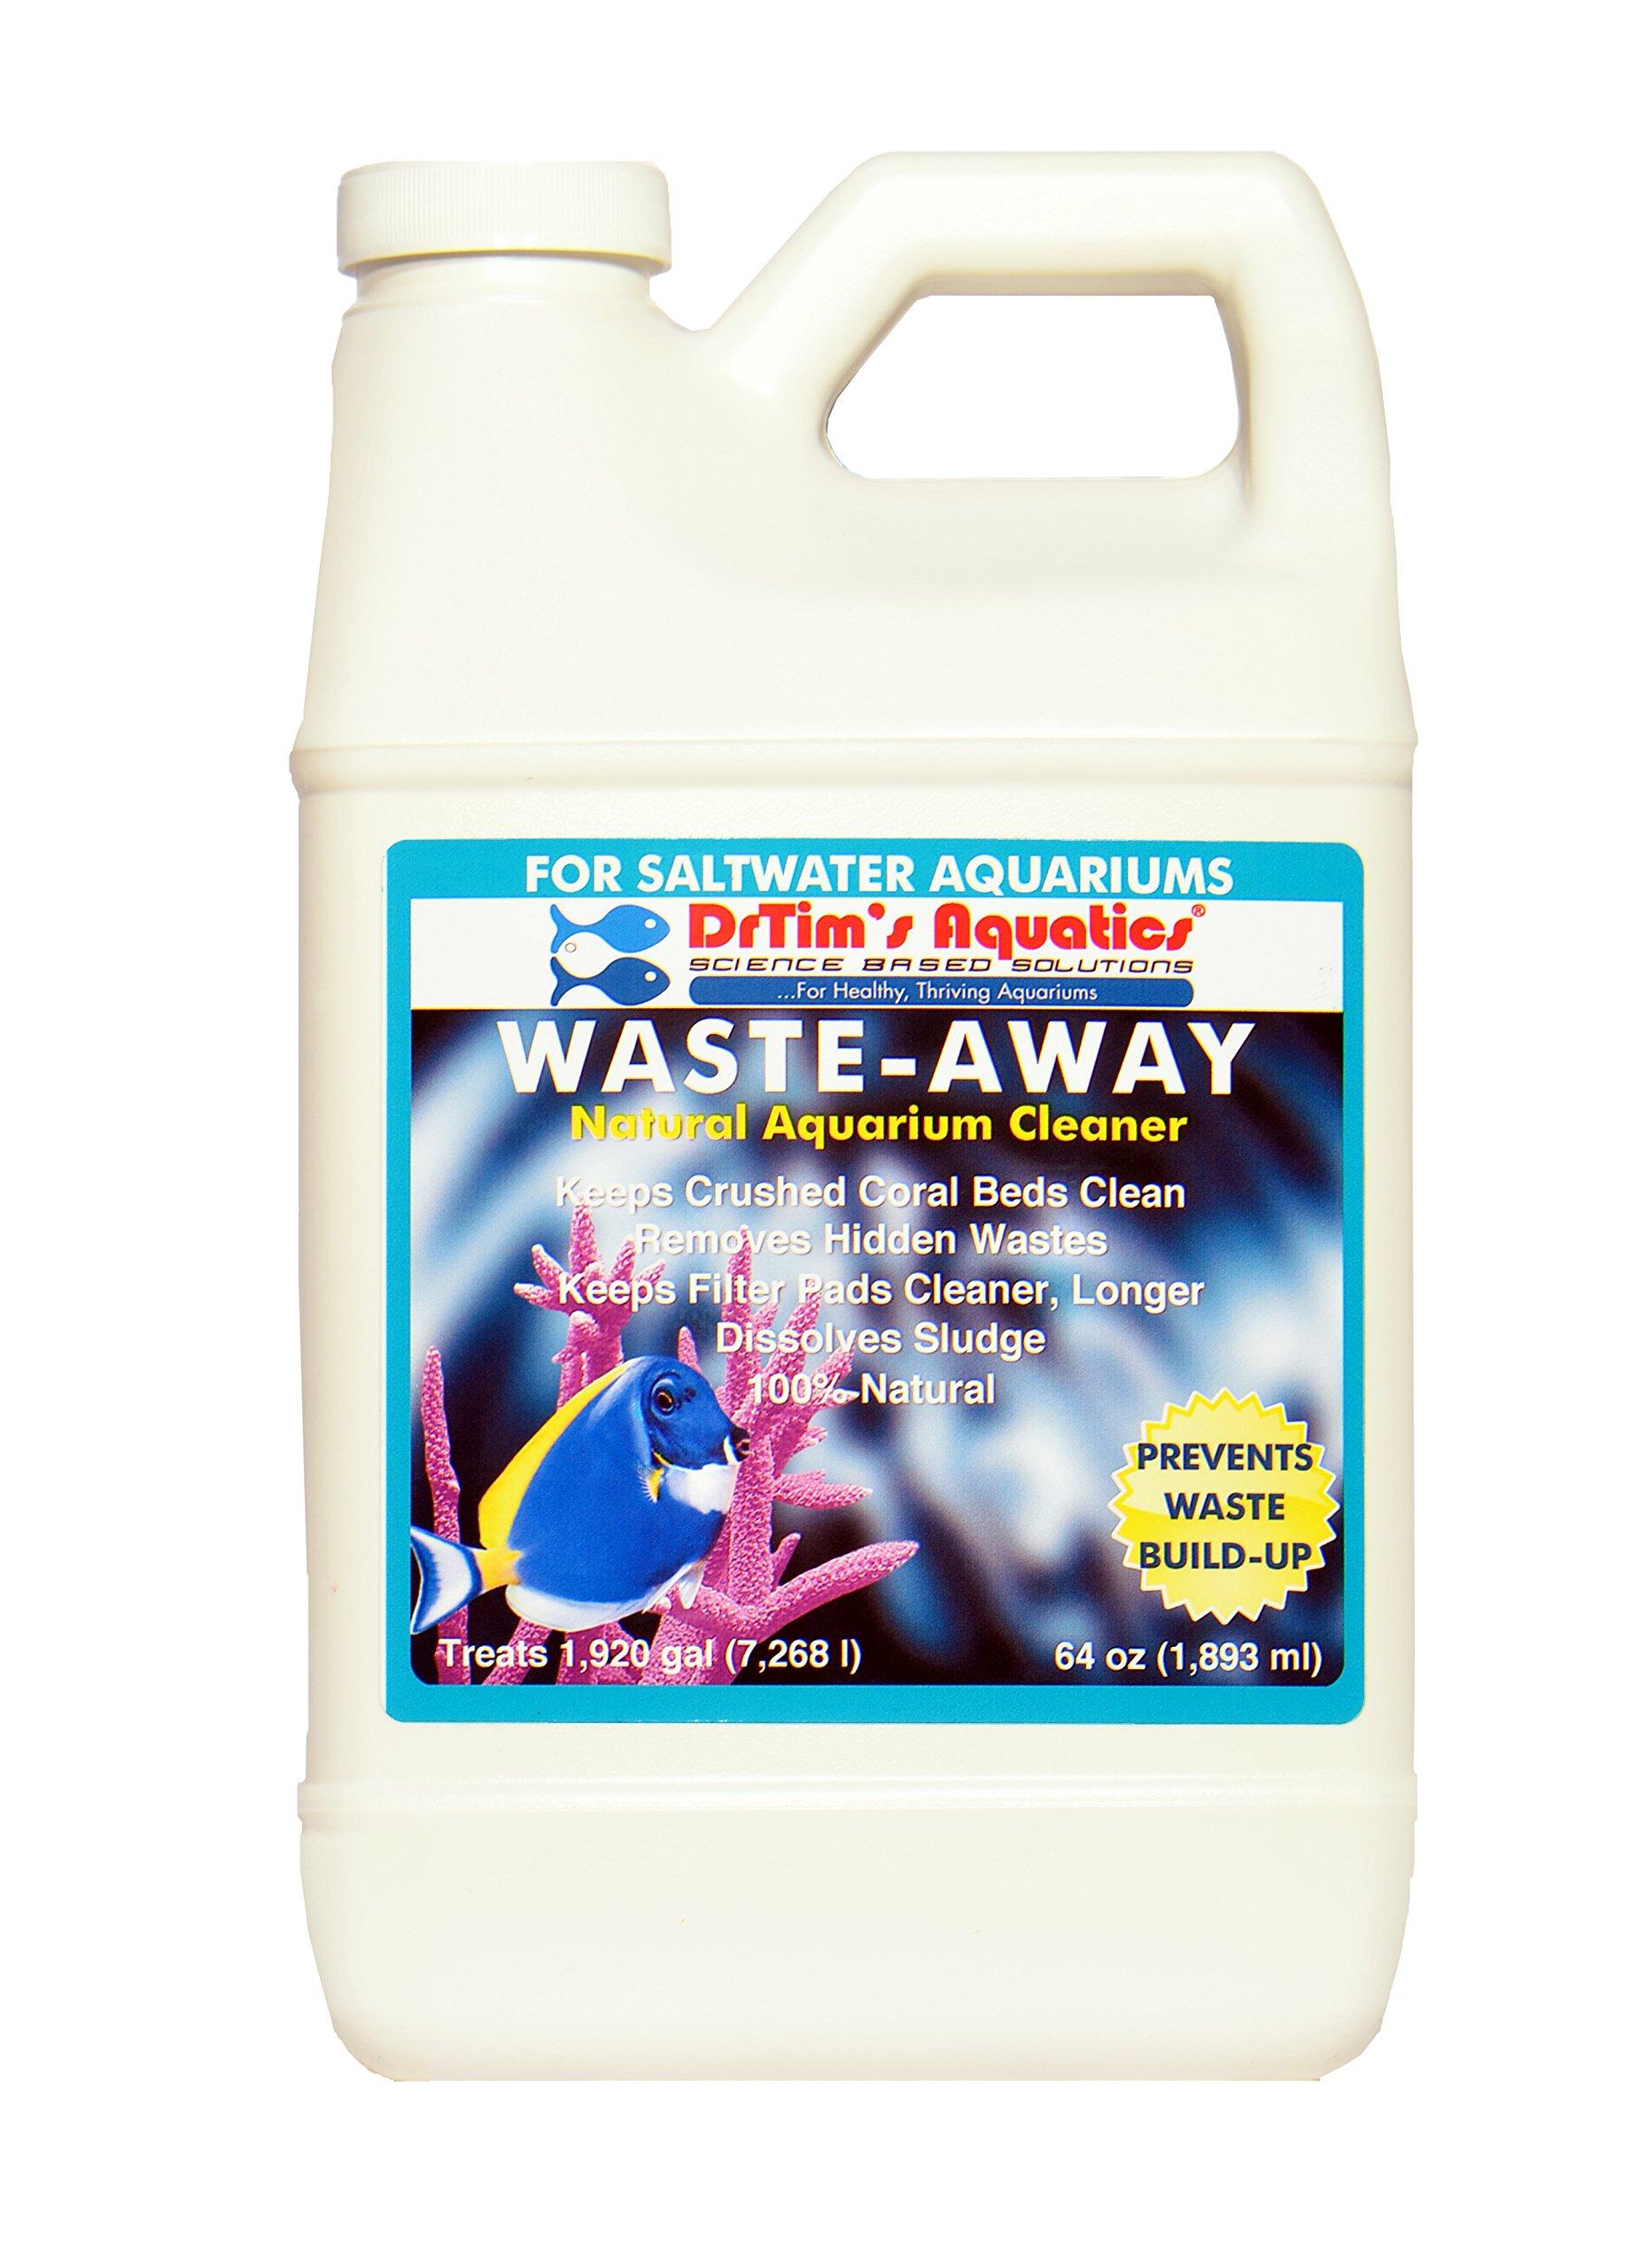 DrTim's Aquatics Waste-Away Natural Aquarium Cleaner, Saltwater 64 oz